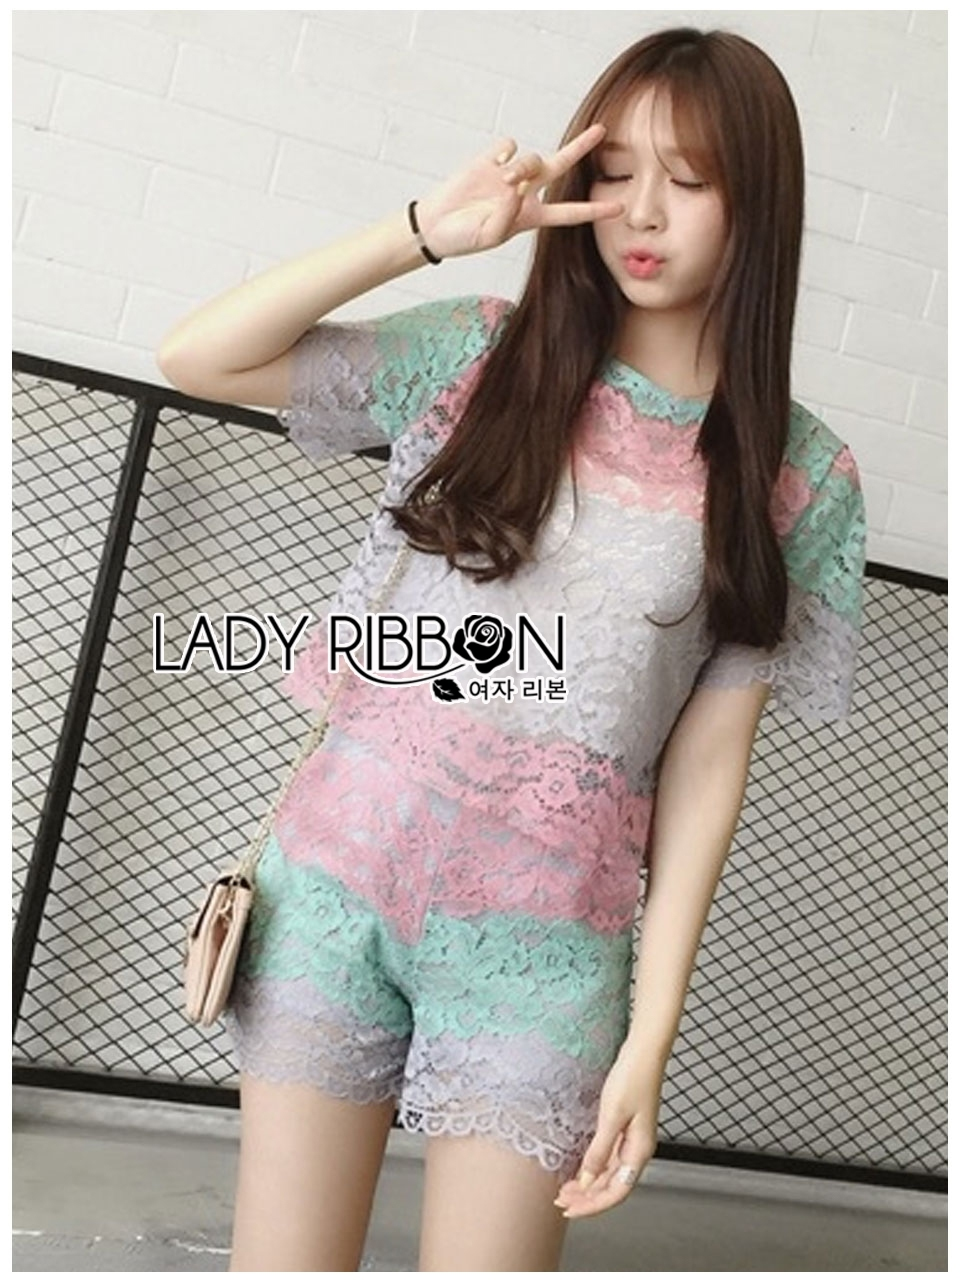 Lady Ribbon's Made Lady Rachel Rainbow Pastel Striped Lace Set